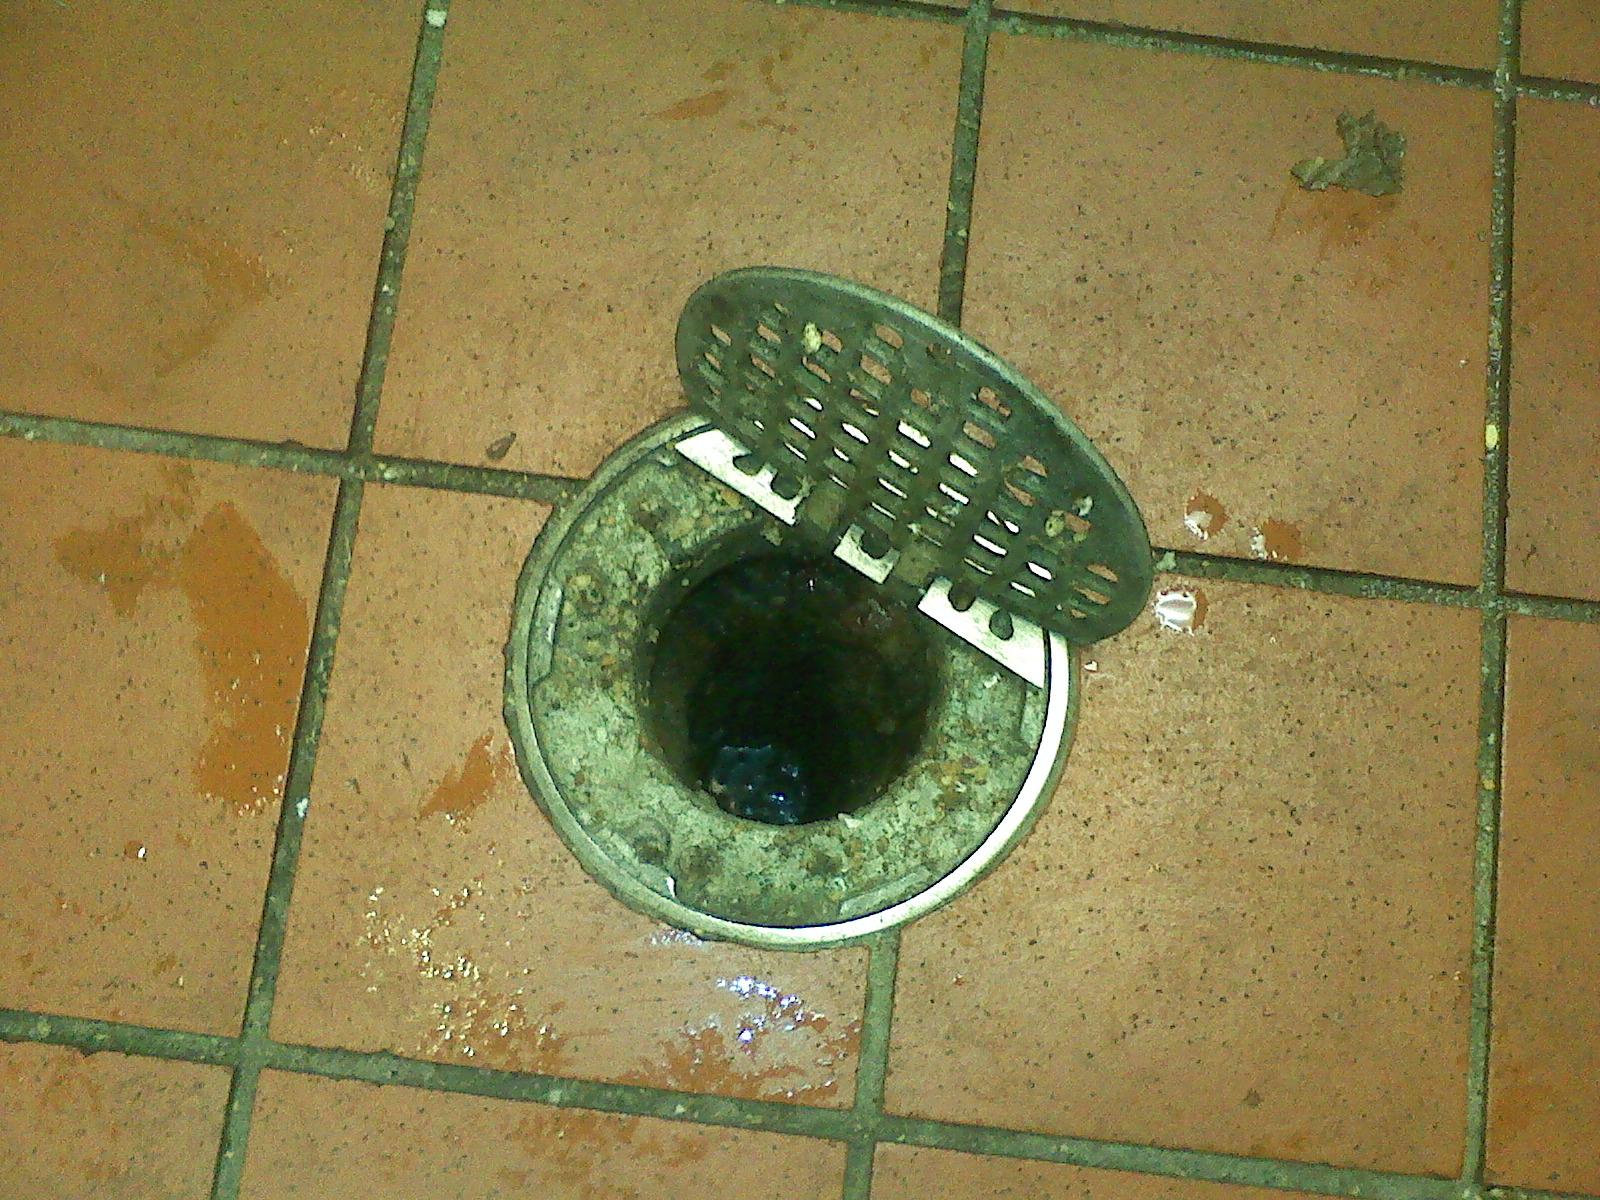 Drain flies bathroom - Another Dirty Drain Needing Treatmentdrain Flies